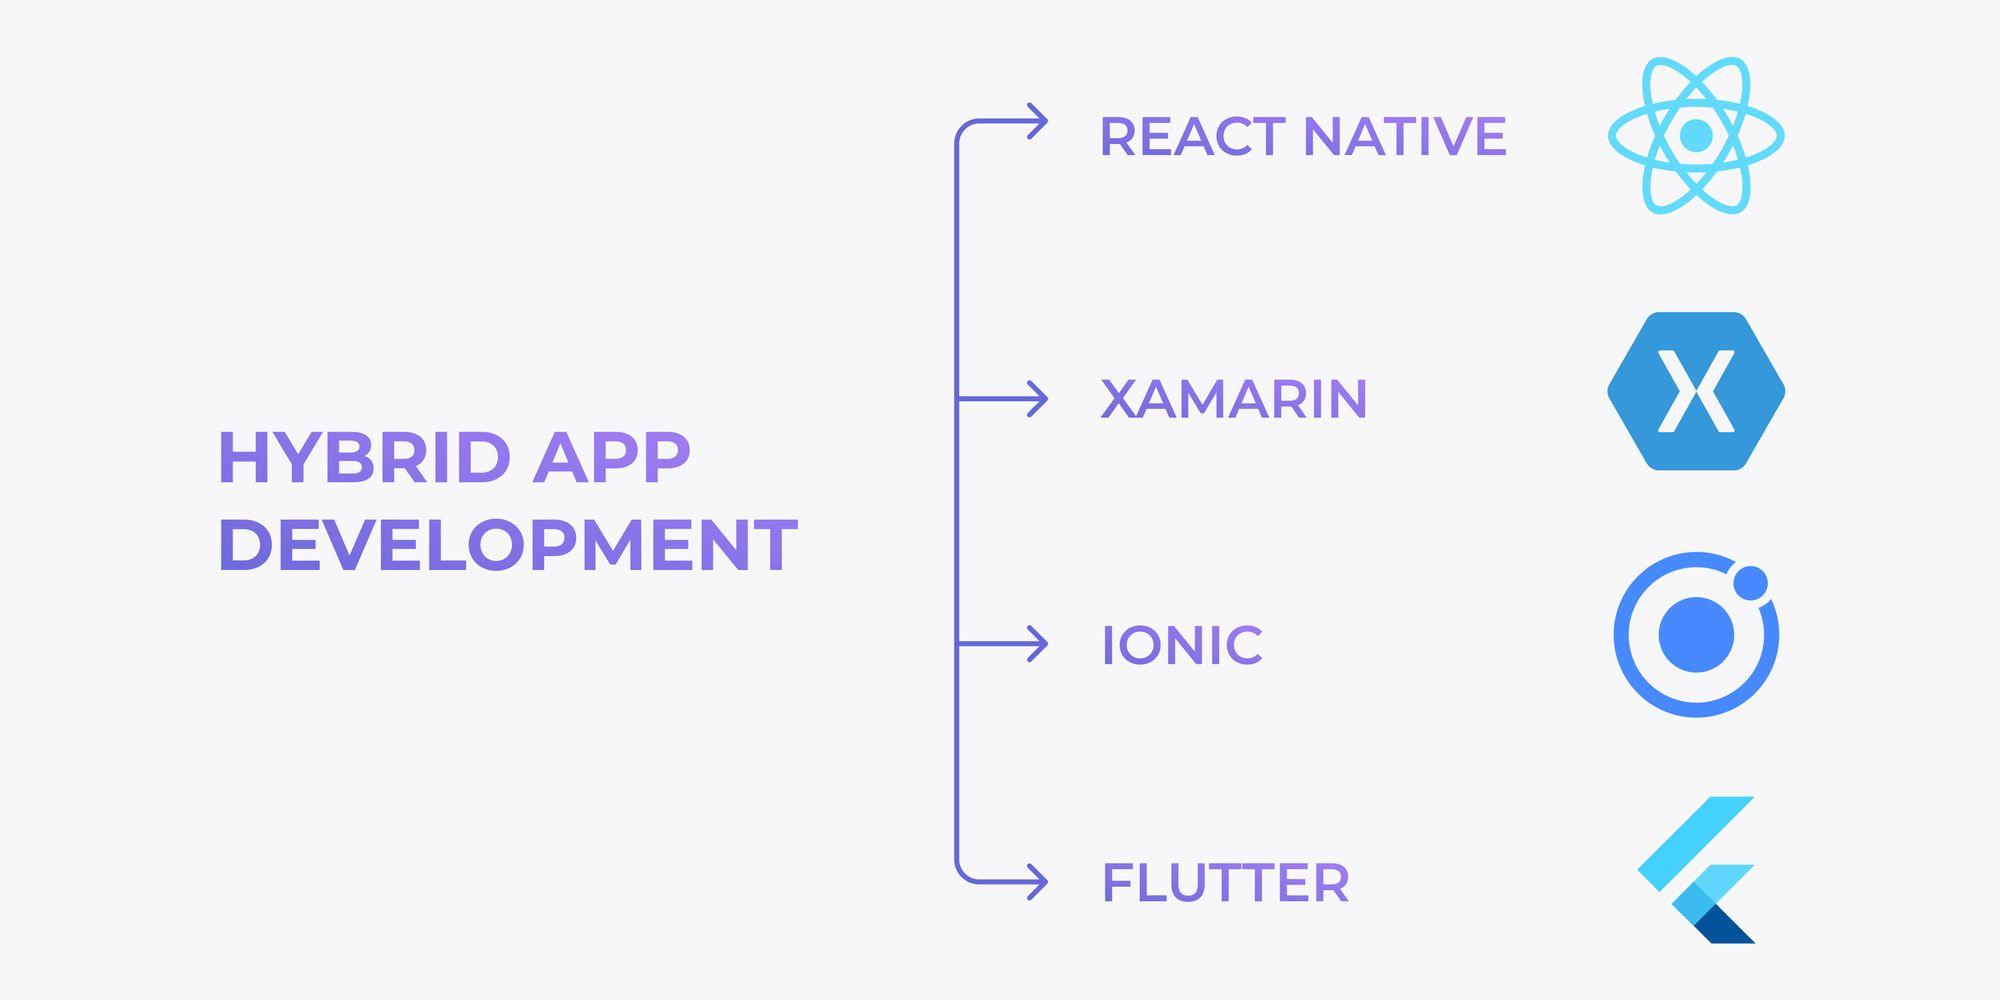 hybrid-app-development-3